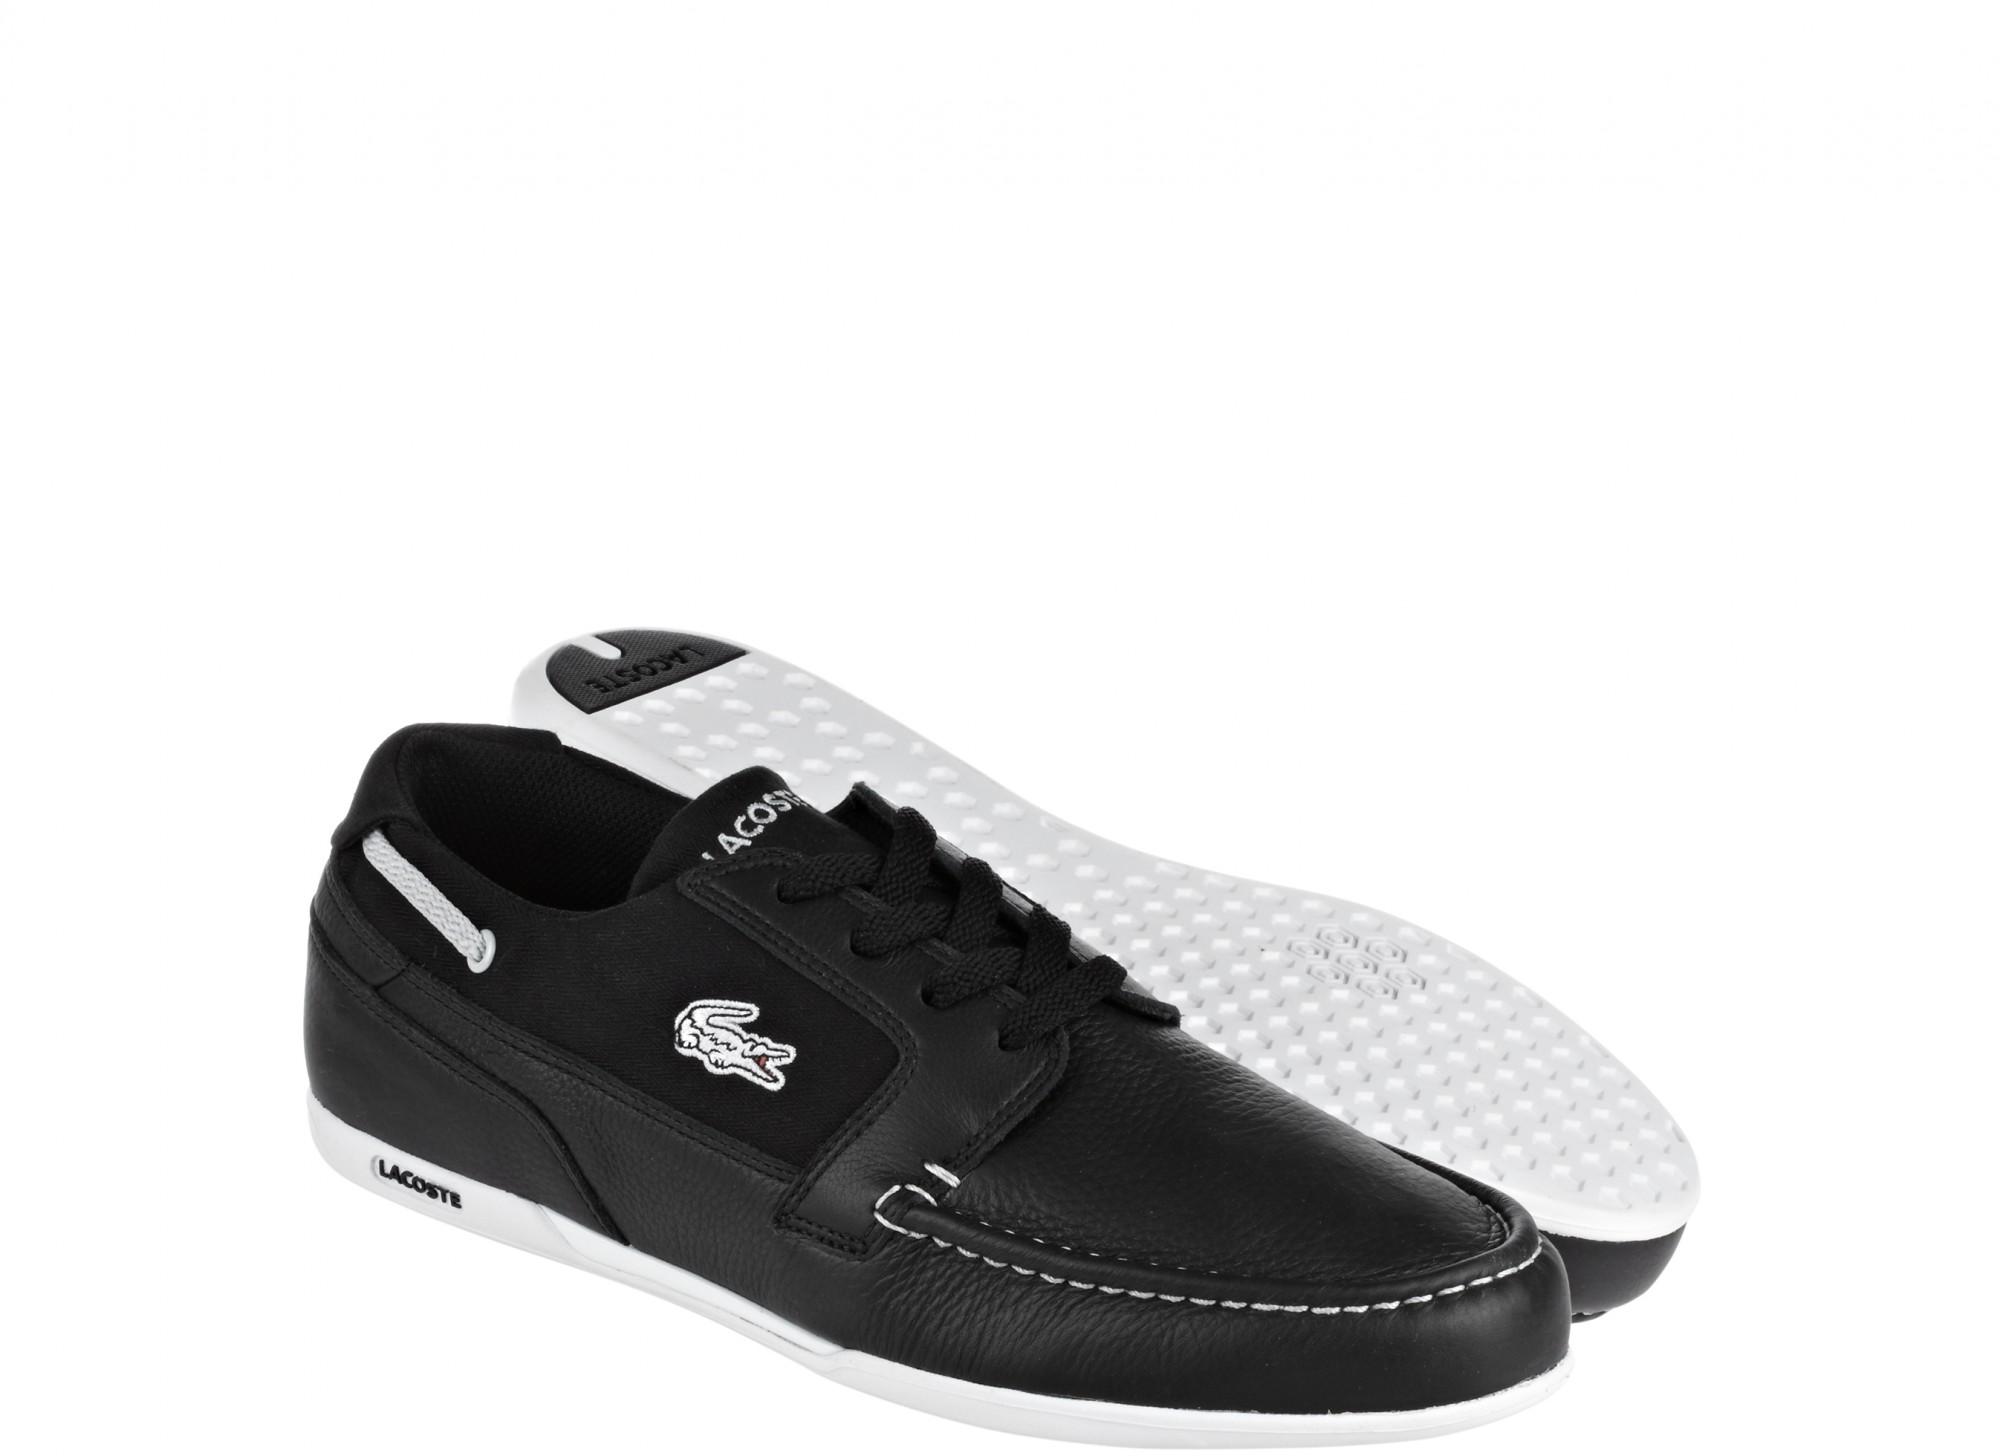 lacoste schuhe sneaker dreyfus gr 47 freizeitschuhe. Black Bedroom Furniture Sets. Home Design Ideas